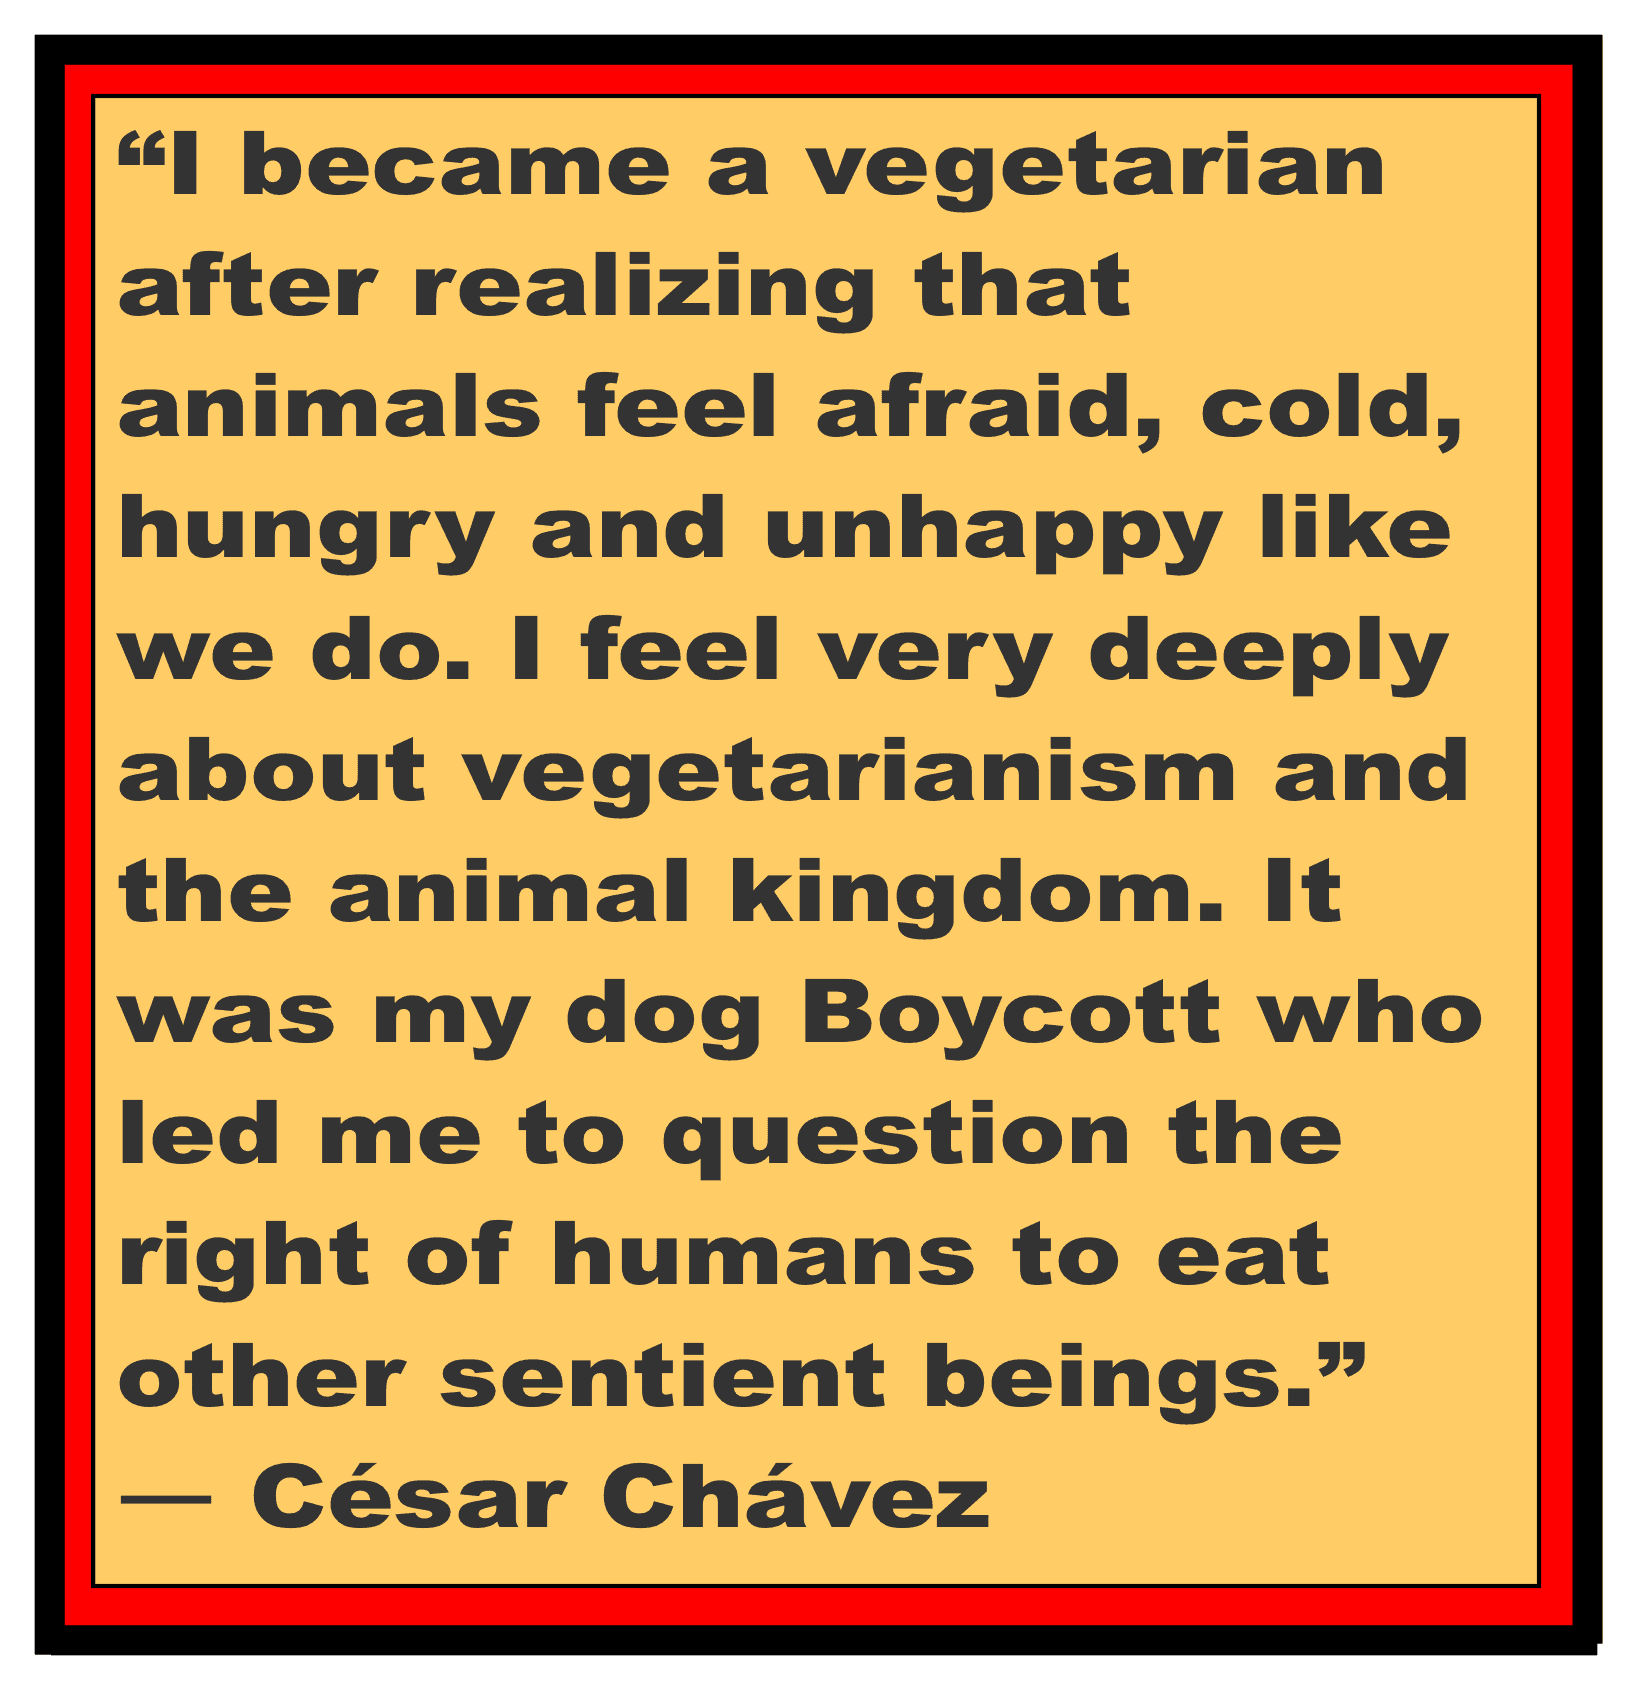 Vegetarian Cesar Chavez